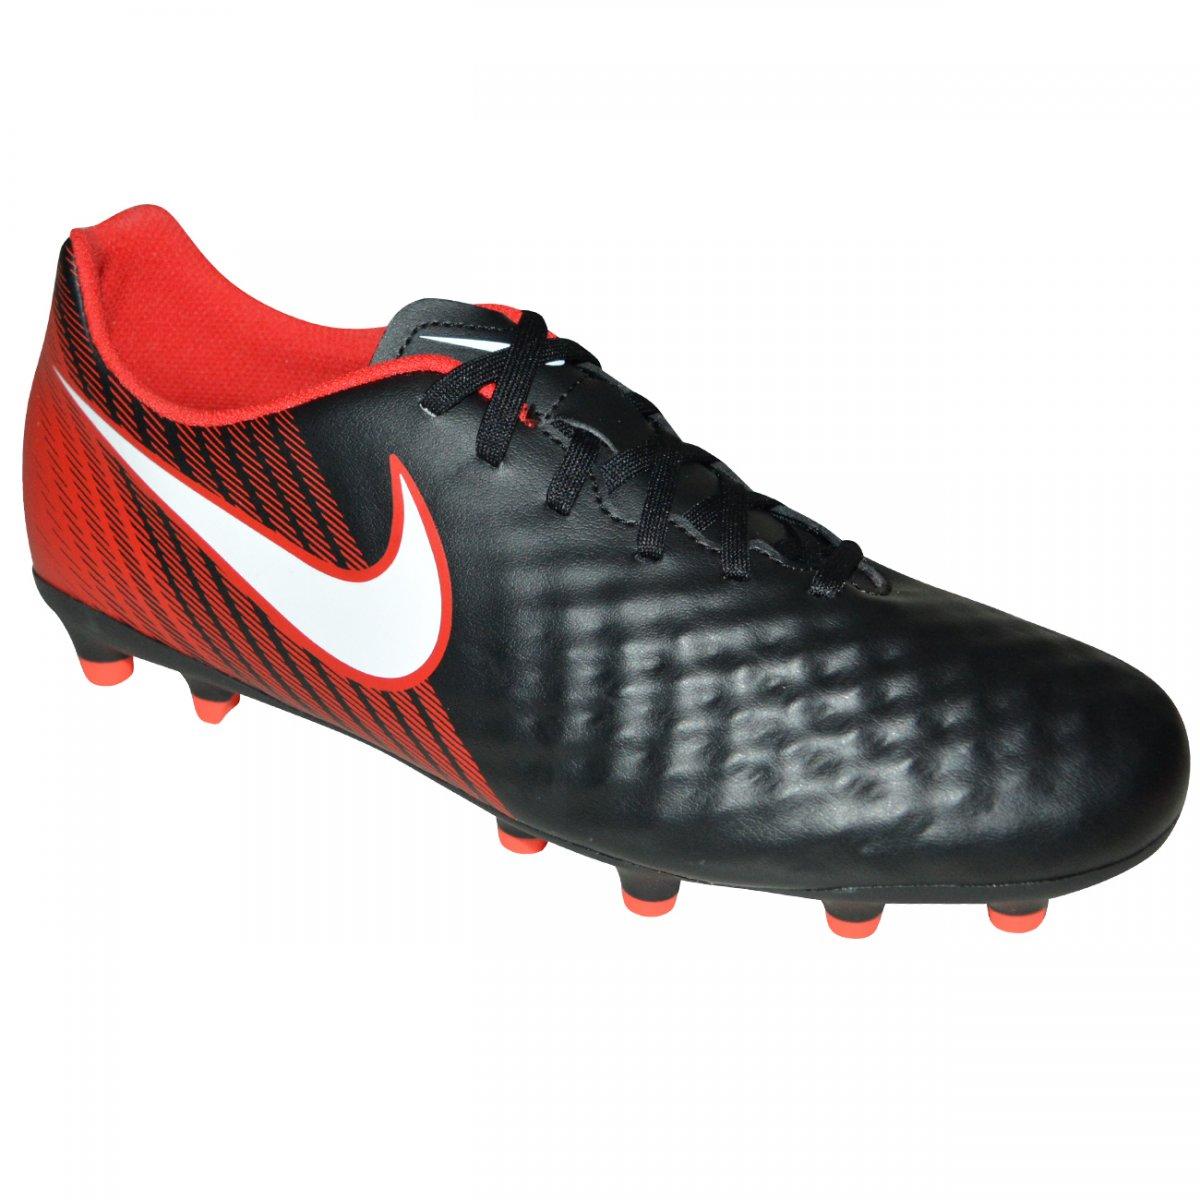 4c78de794e Chuteira Nike Magista Ola II 844420 061 - Preto vermelho branco - Chuteira  Nike